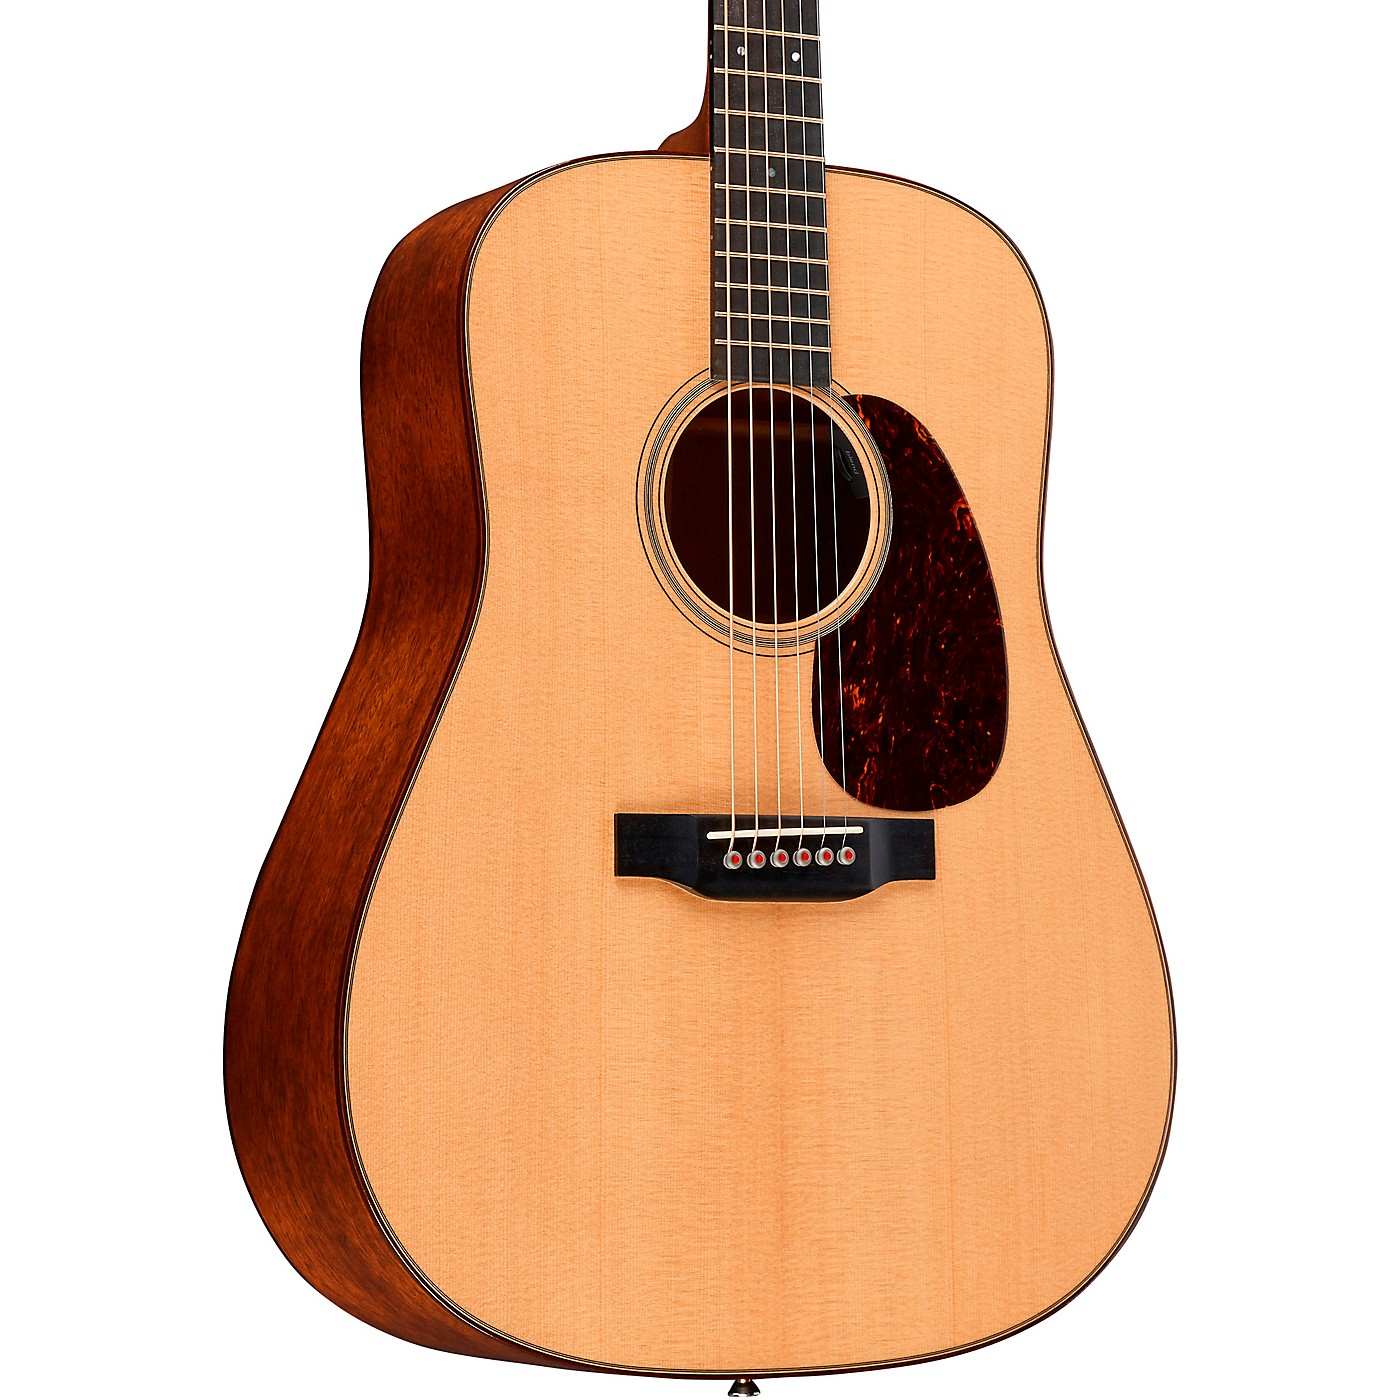 Martin D-18E Modern Deluxe Dreadnought Acoustic-Electric Guitar thumbnail